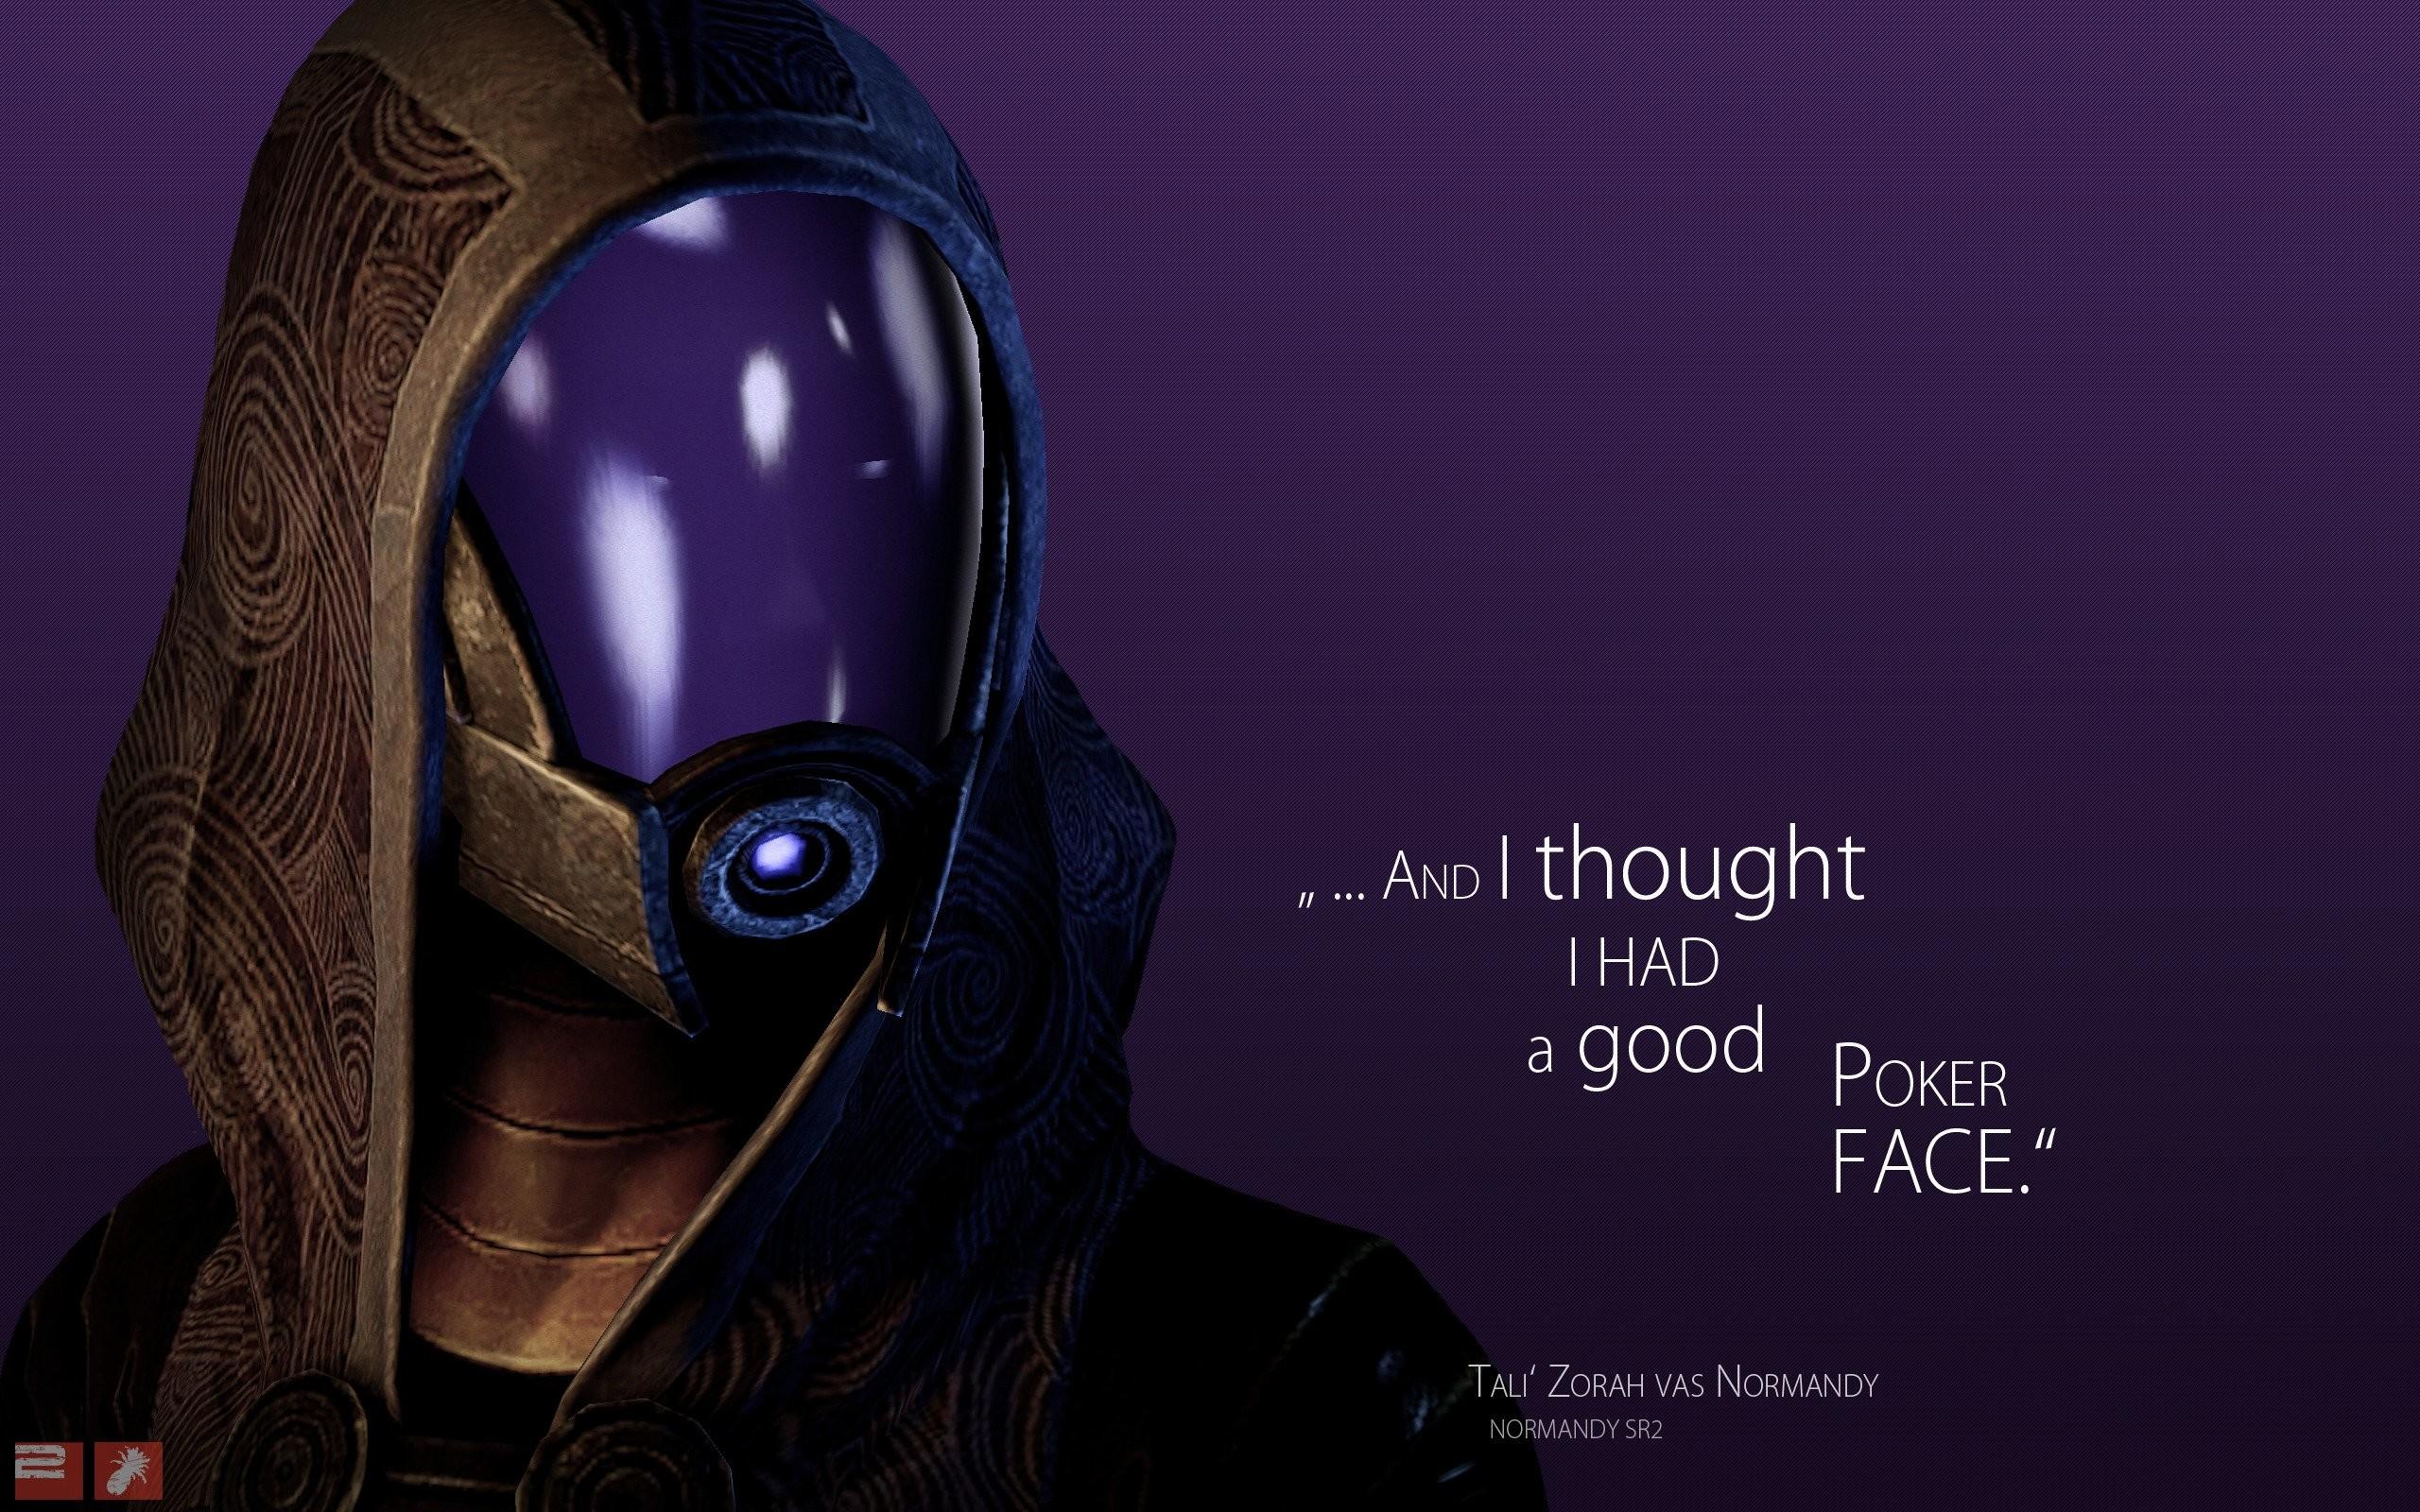 Funny Mass Effect Quarian Quotes Tali Zorah Nar Rayya